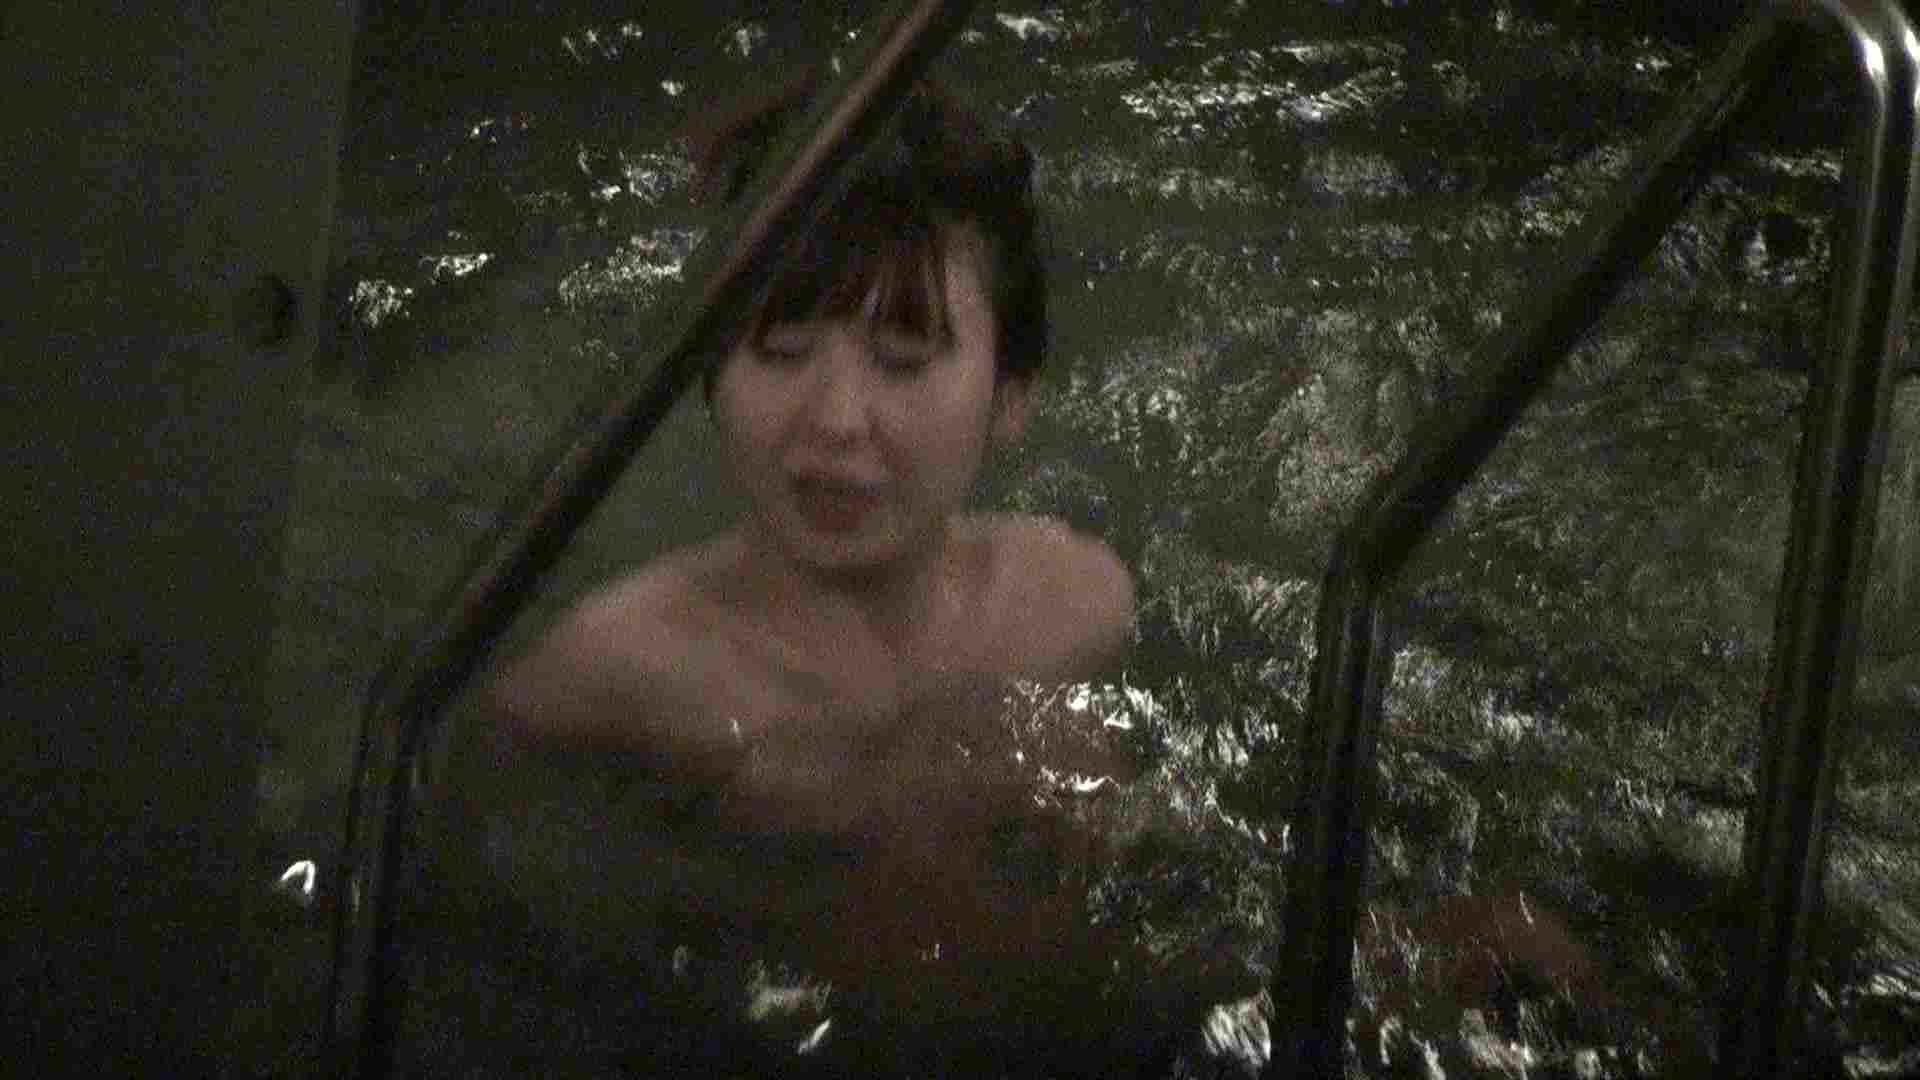 Aquaな露天風呂Vol.410 露天 オマンコ無修正動画無料 29PICs 23